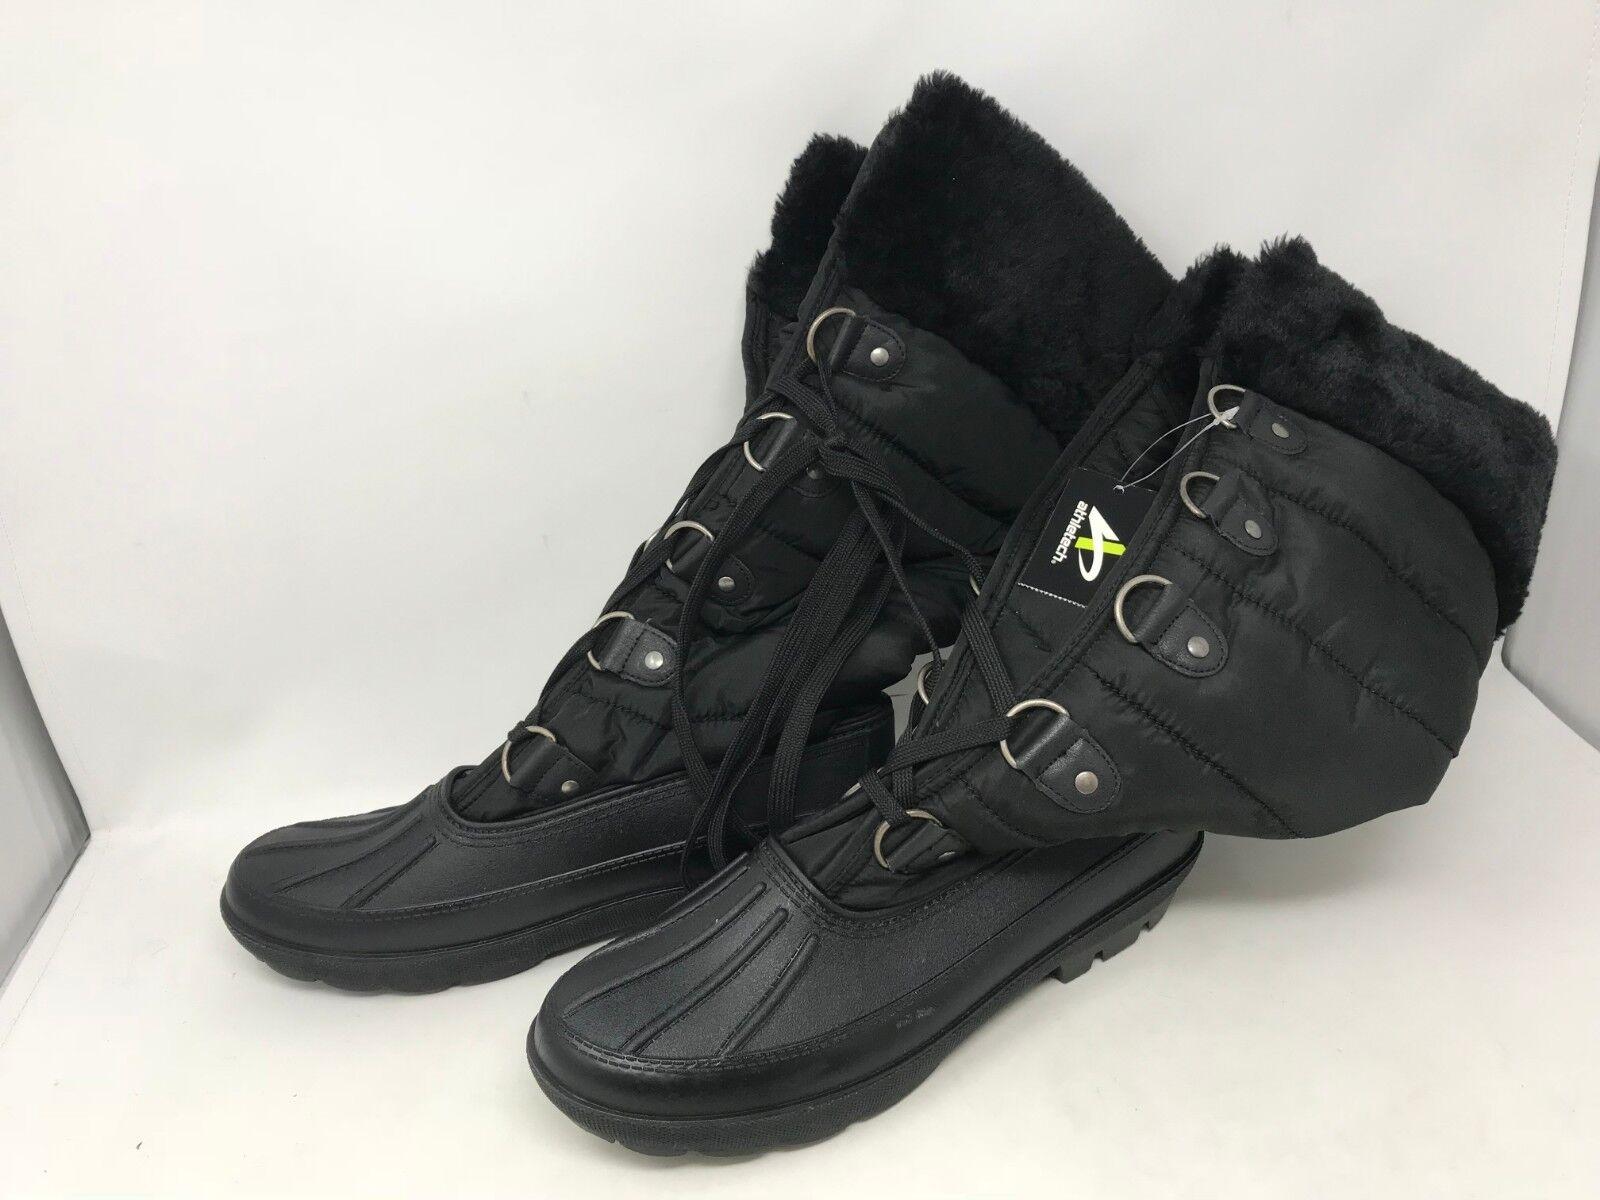 Womens Athletech (30630) Black Anessa Boots (19S)